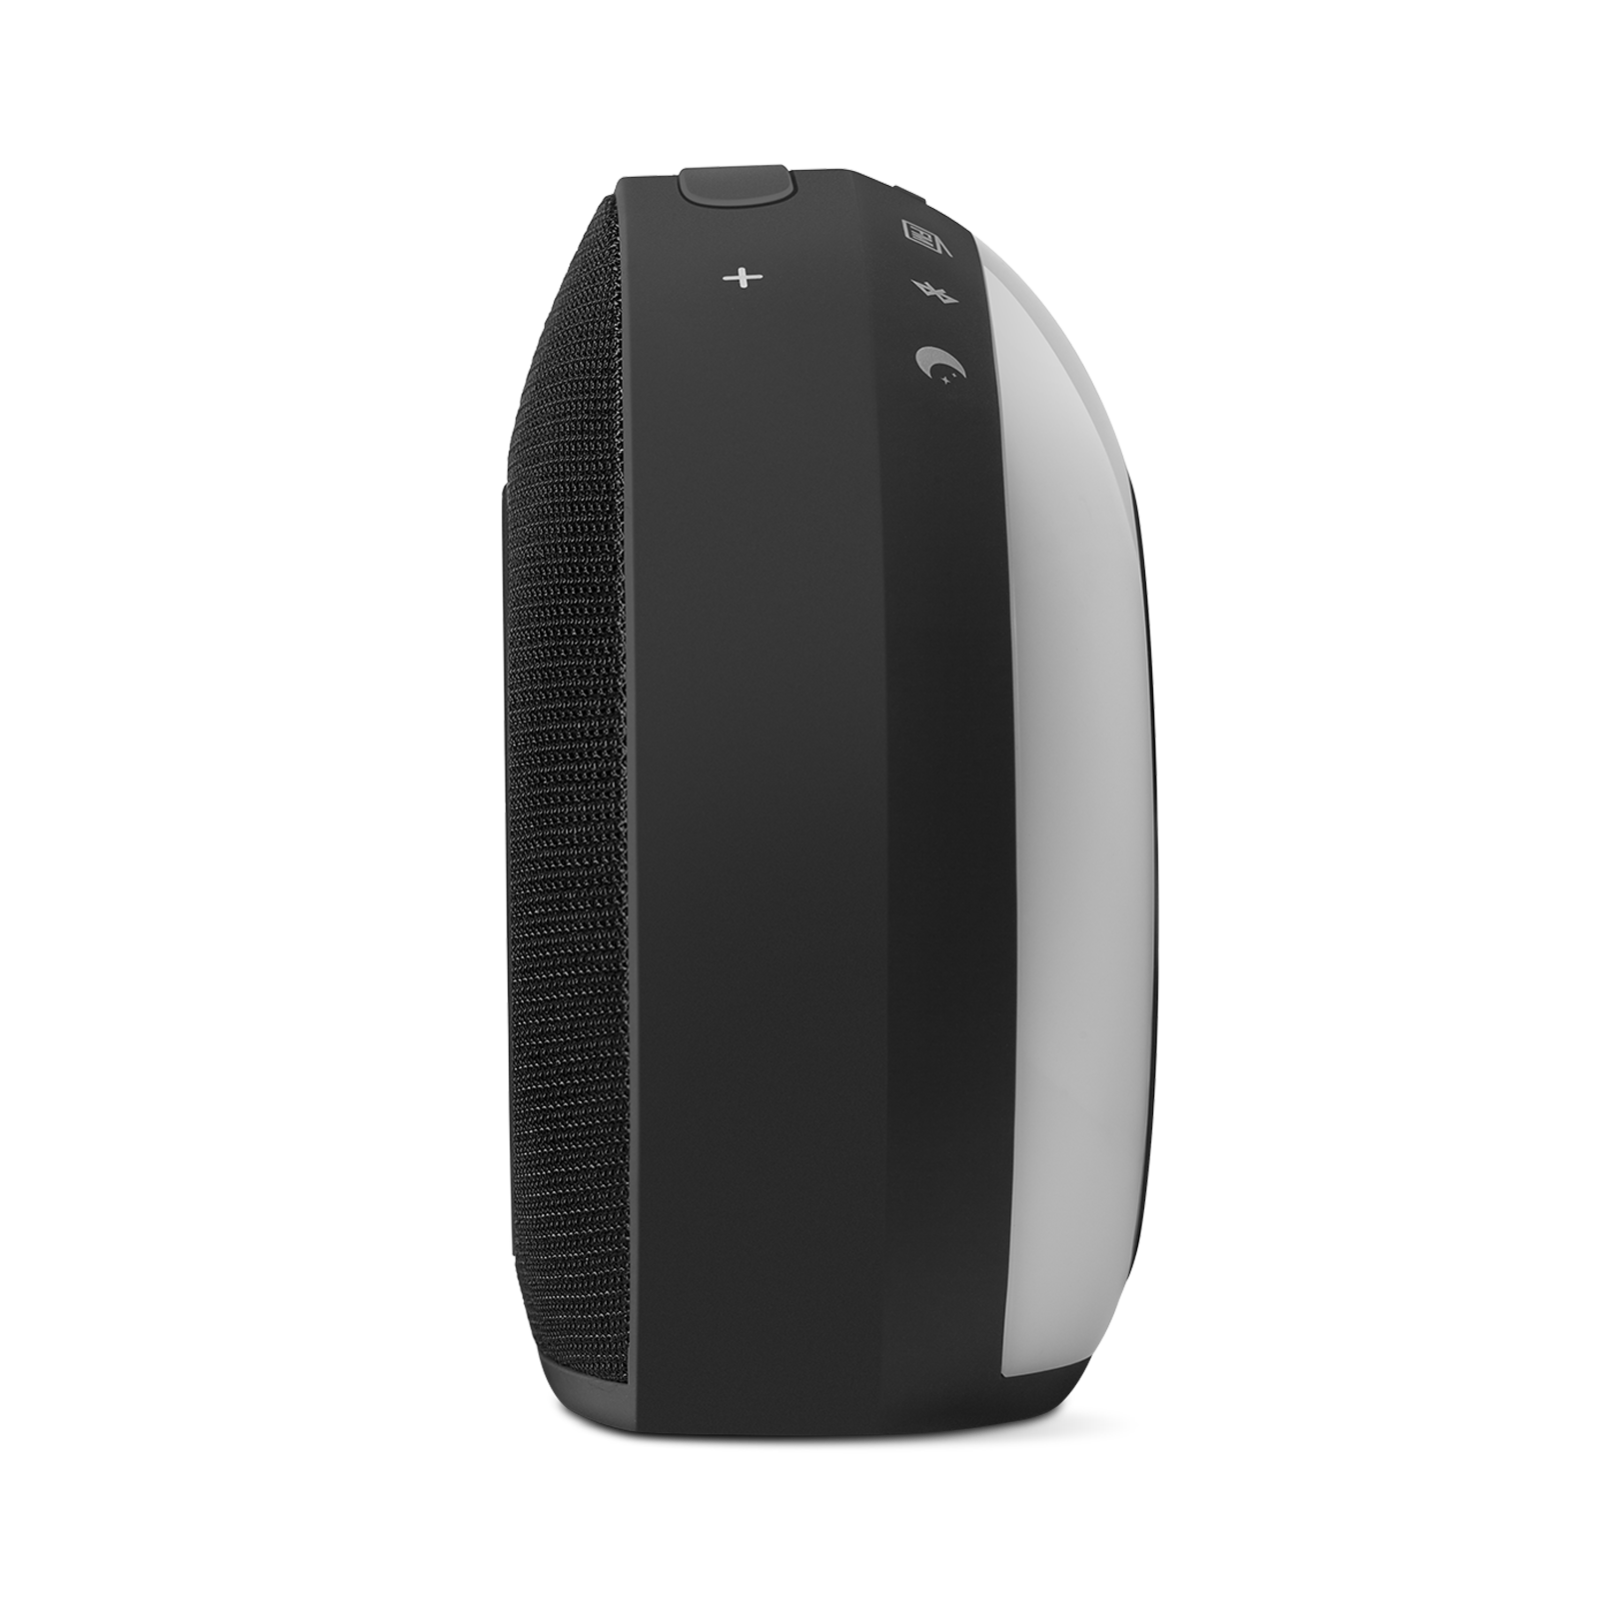 JBL Horizon - Black - Bluetooth clock radio with USB charging and ambient light - Detailshot 5